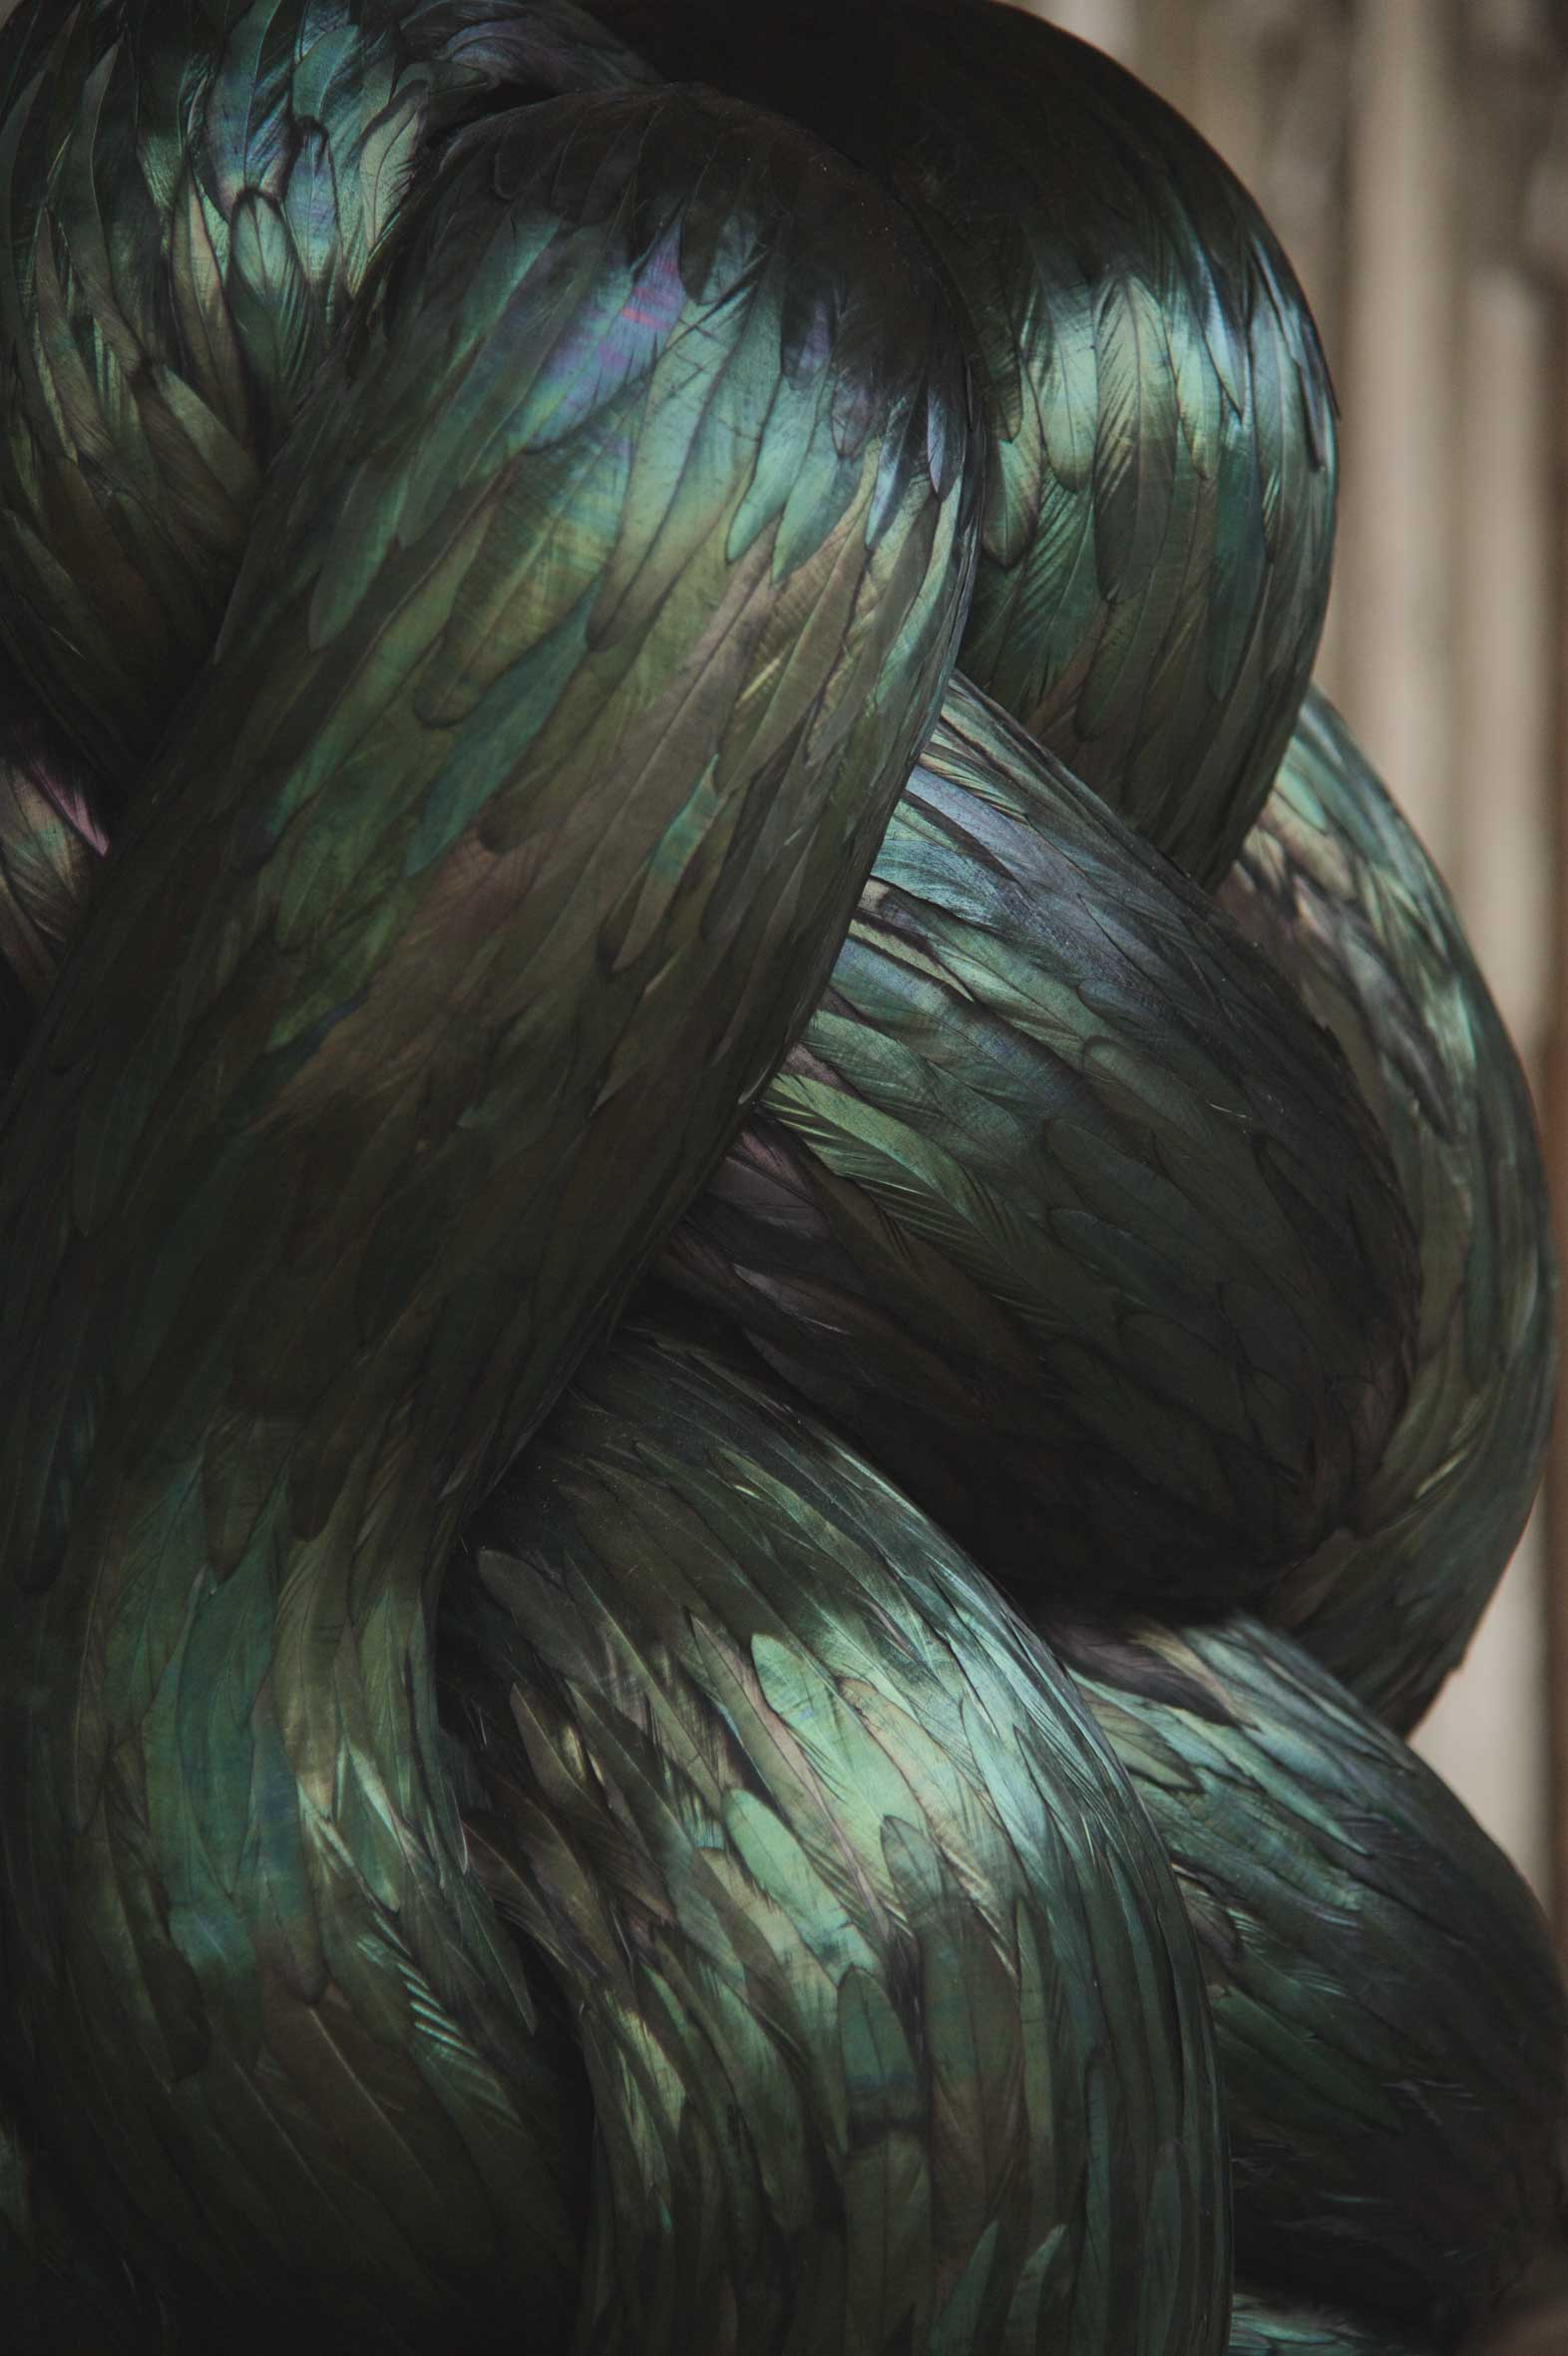 Convolous (detail), 2015, Kate MccGwire - Photo JP Bland